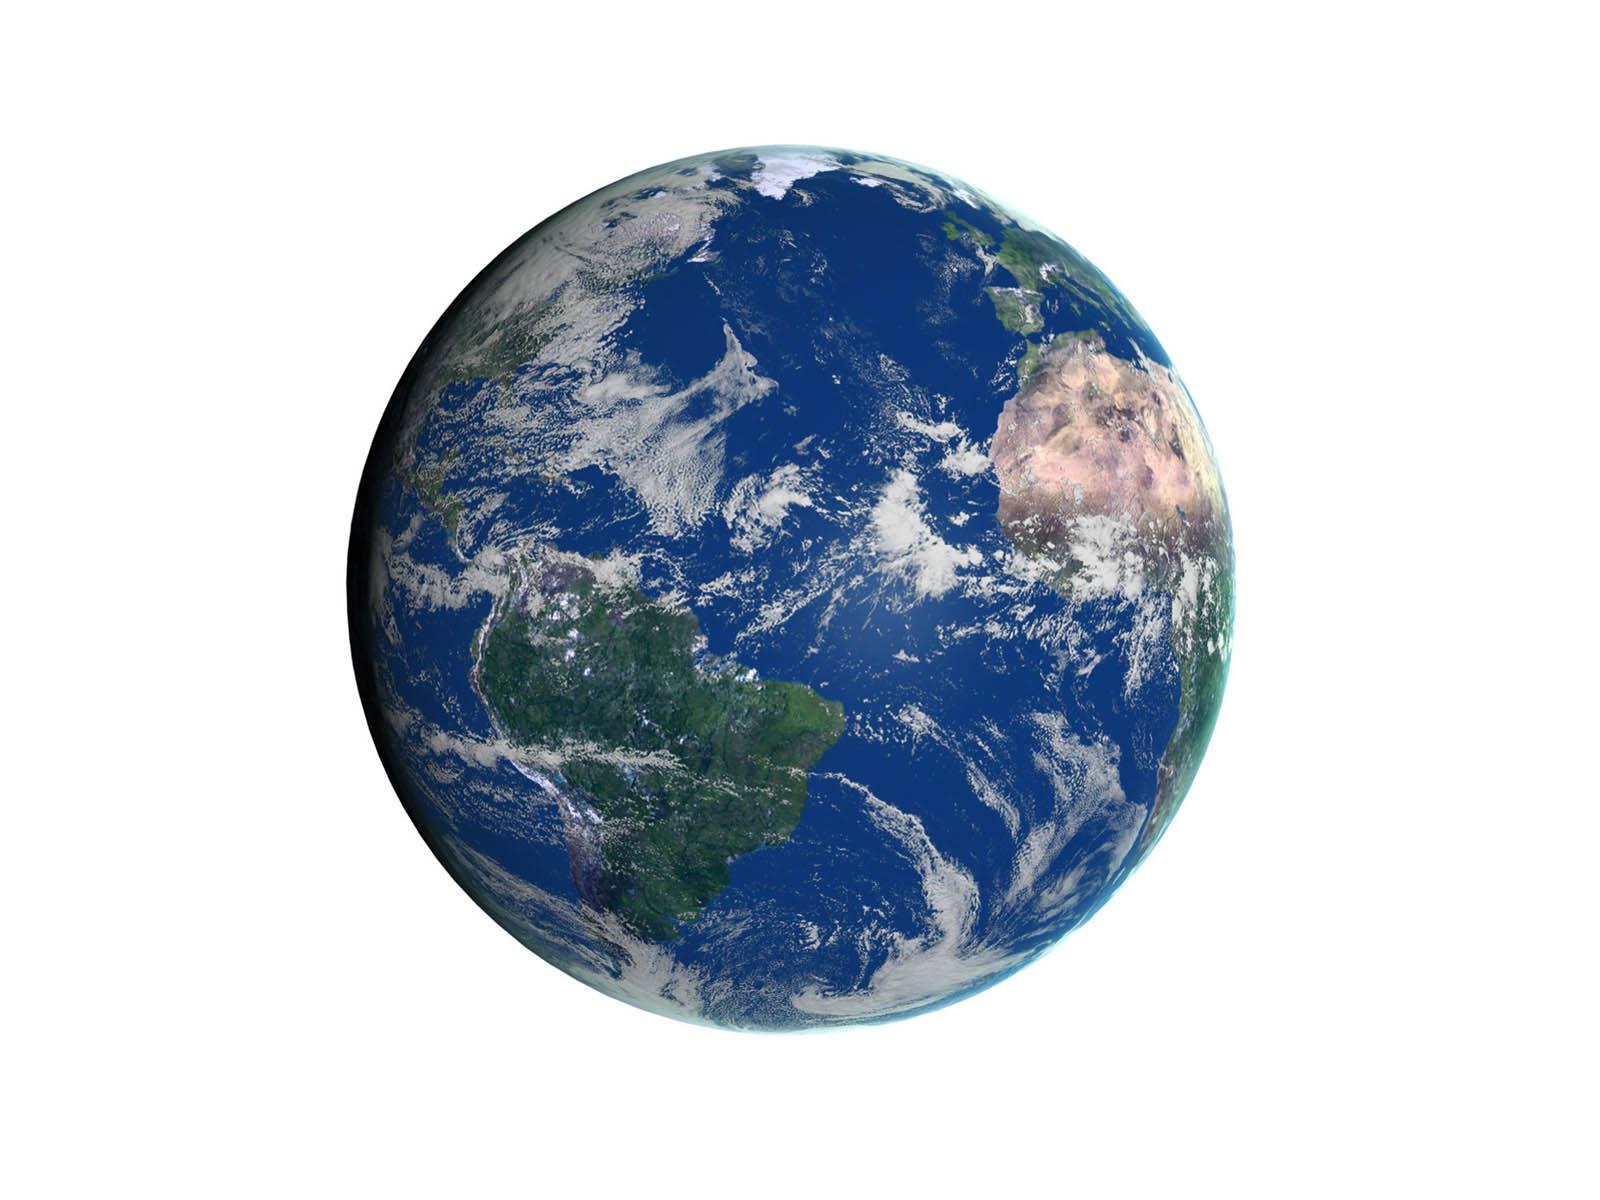 planet earth globe - photo #15